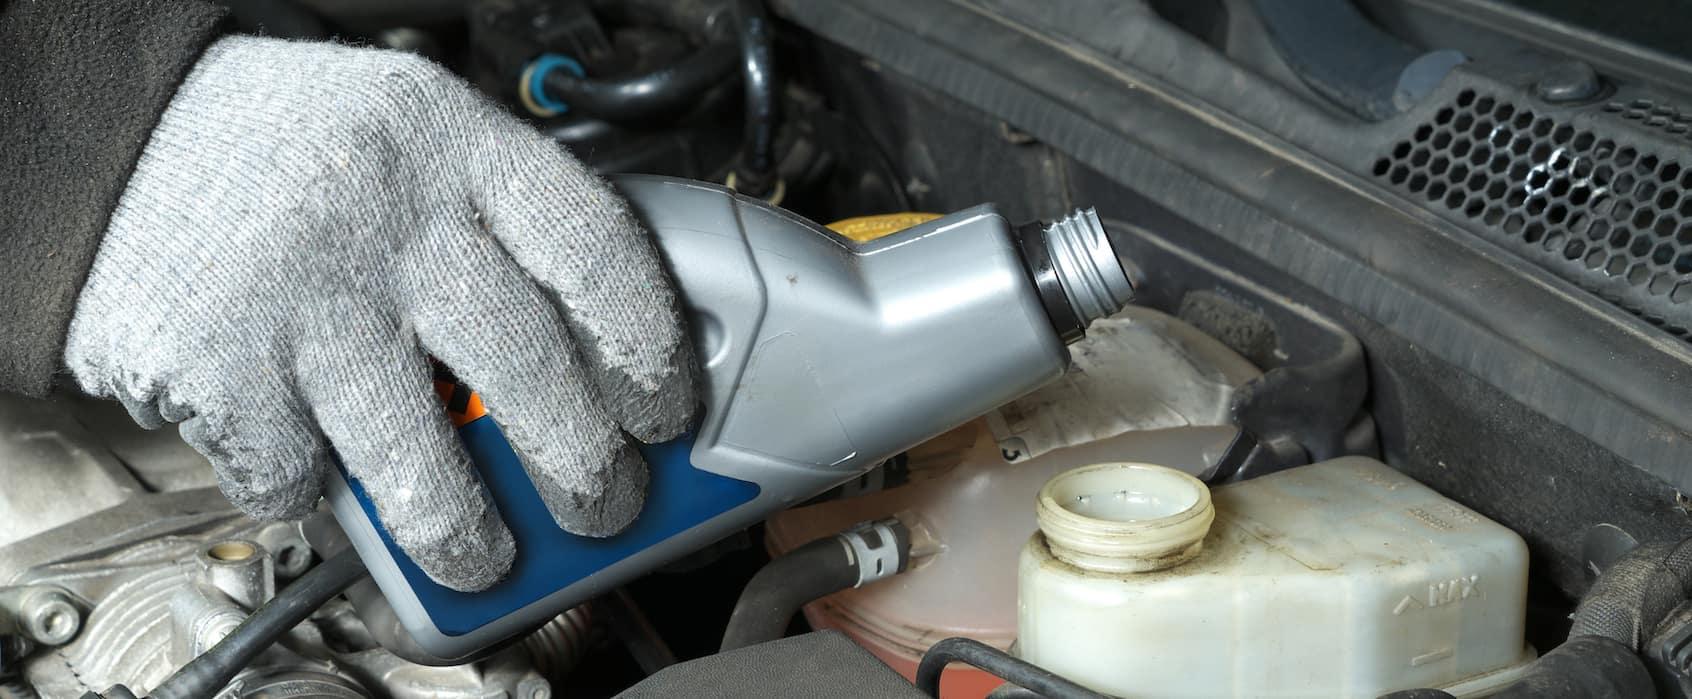 Brake Fluid Check